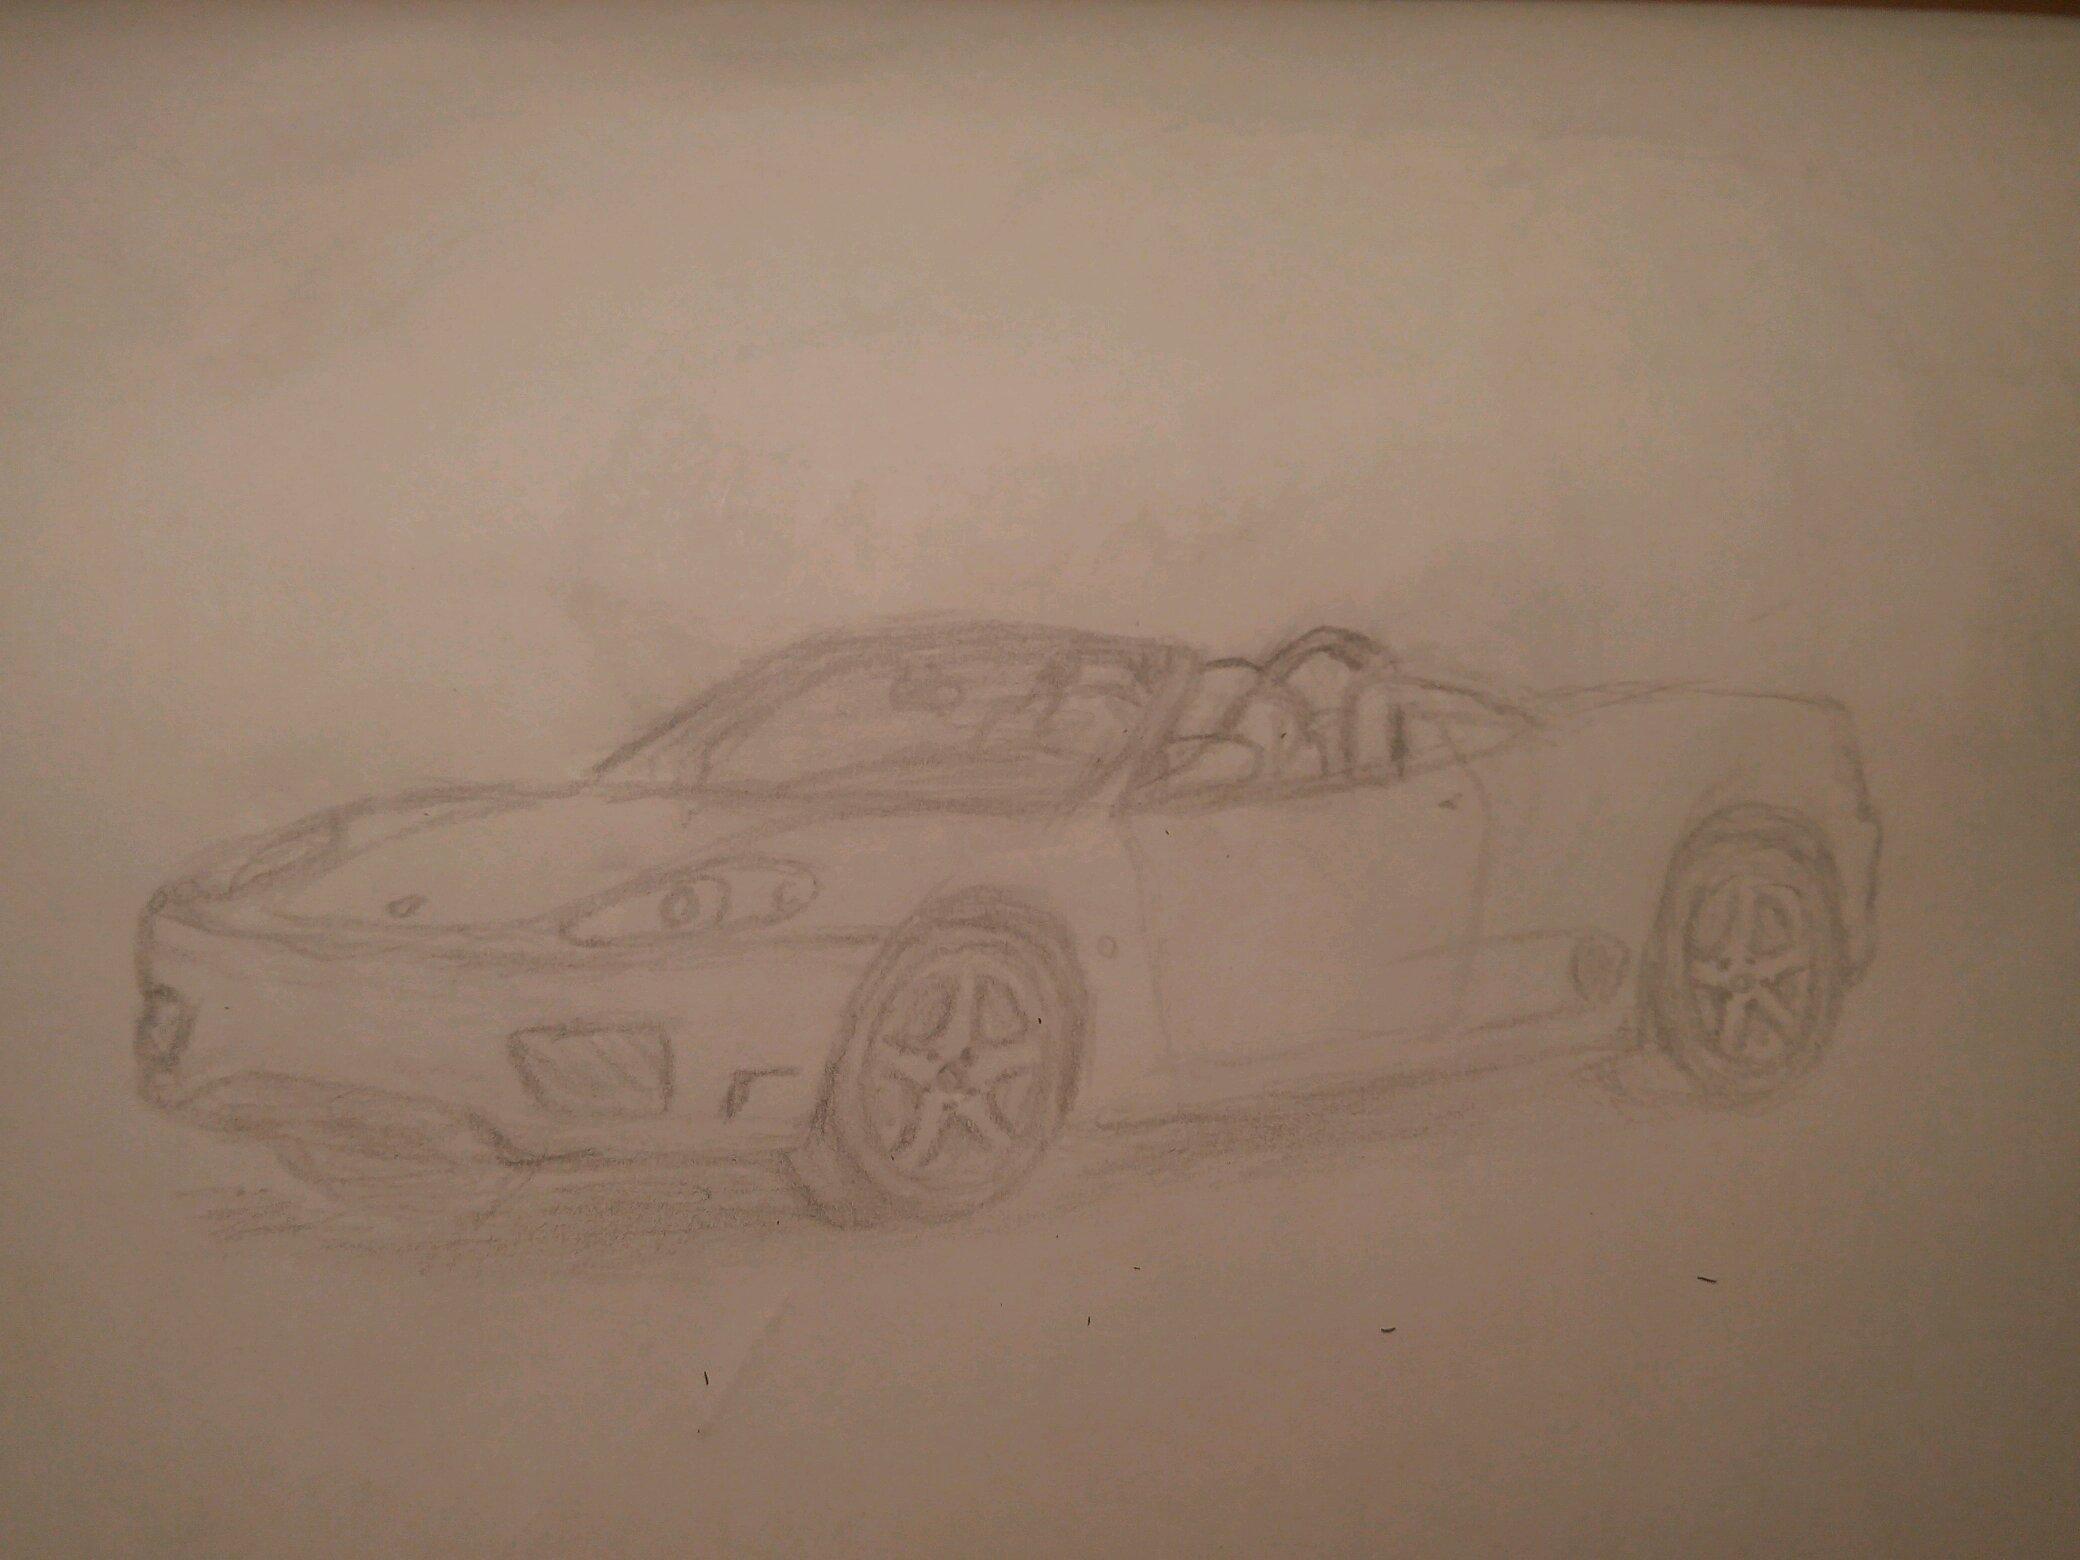 2000 Ferrari 360 Spider Drawing